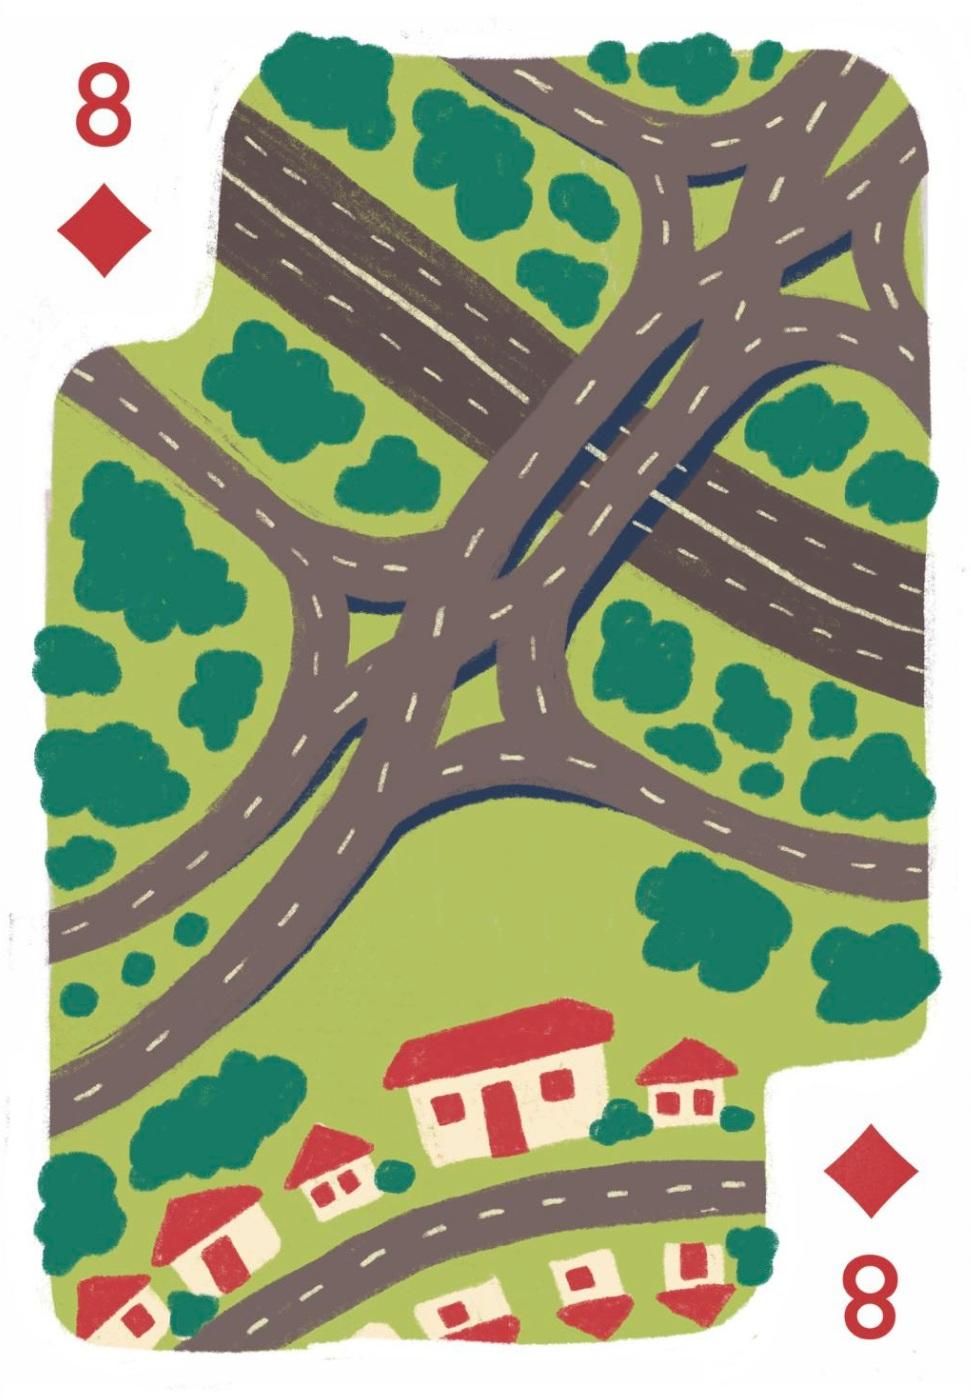 Draft of my card design